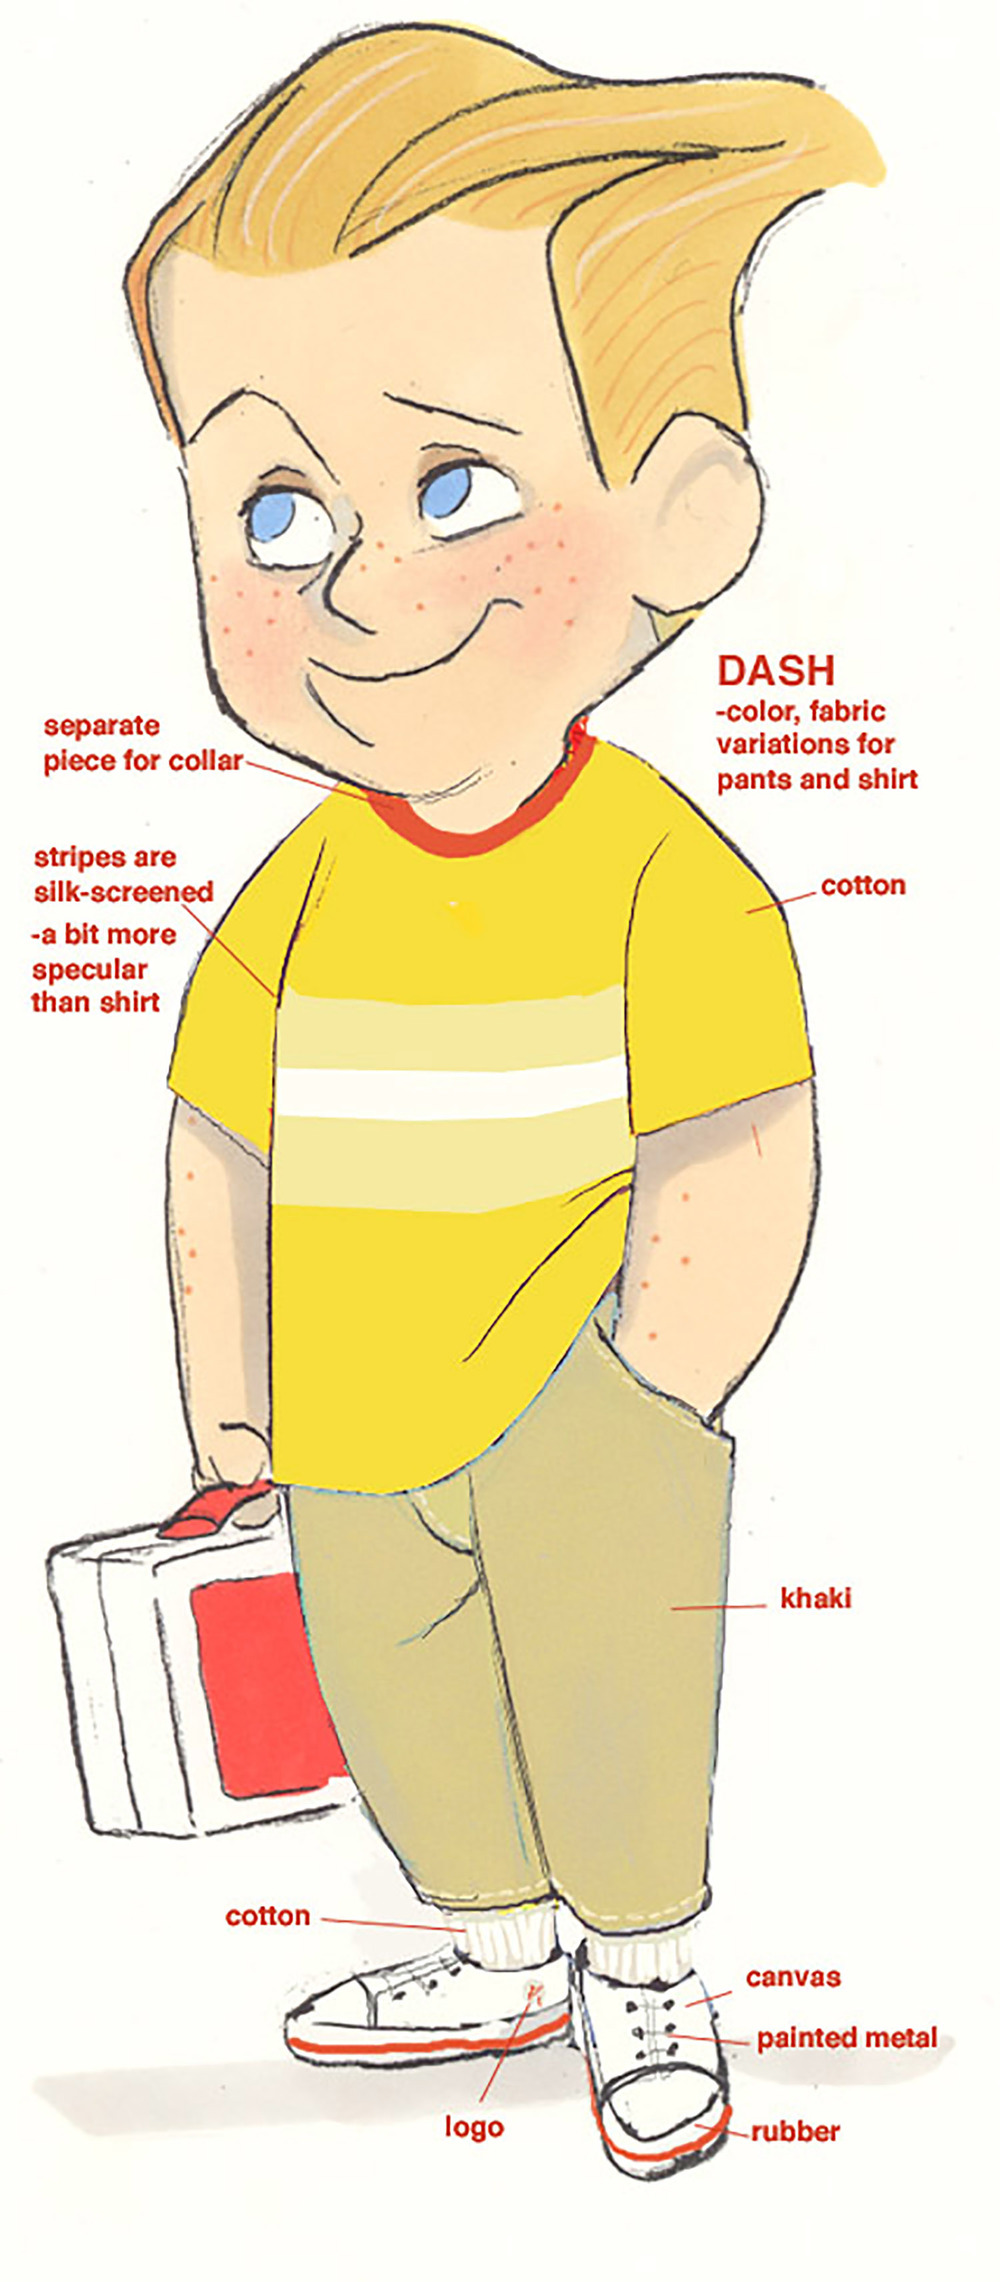 Dash6.jpg